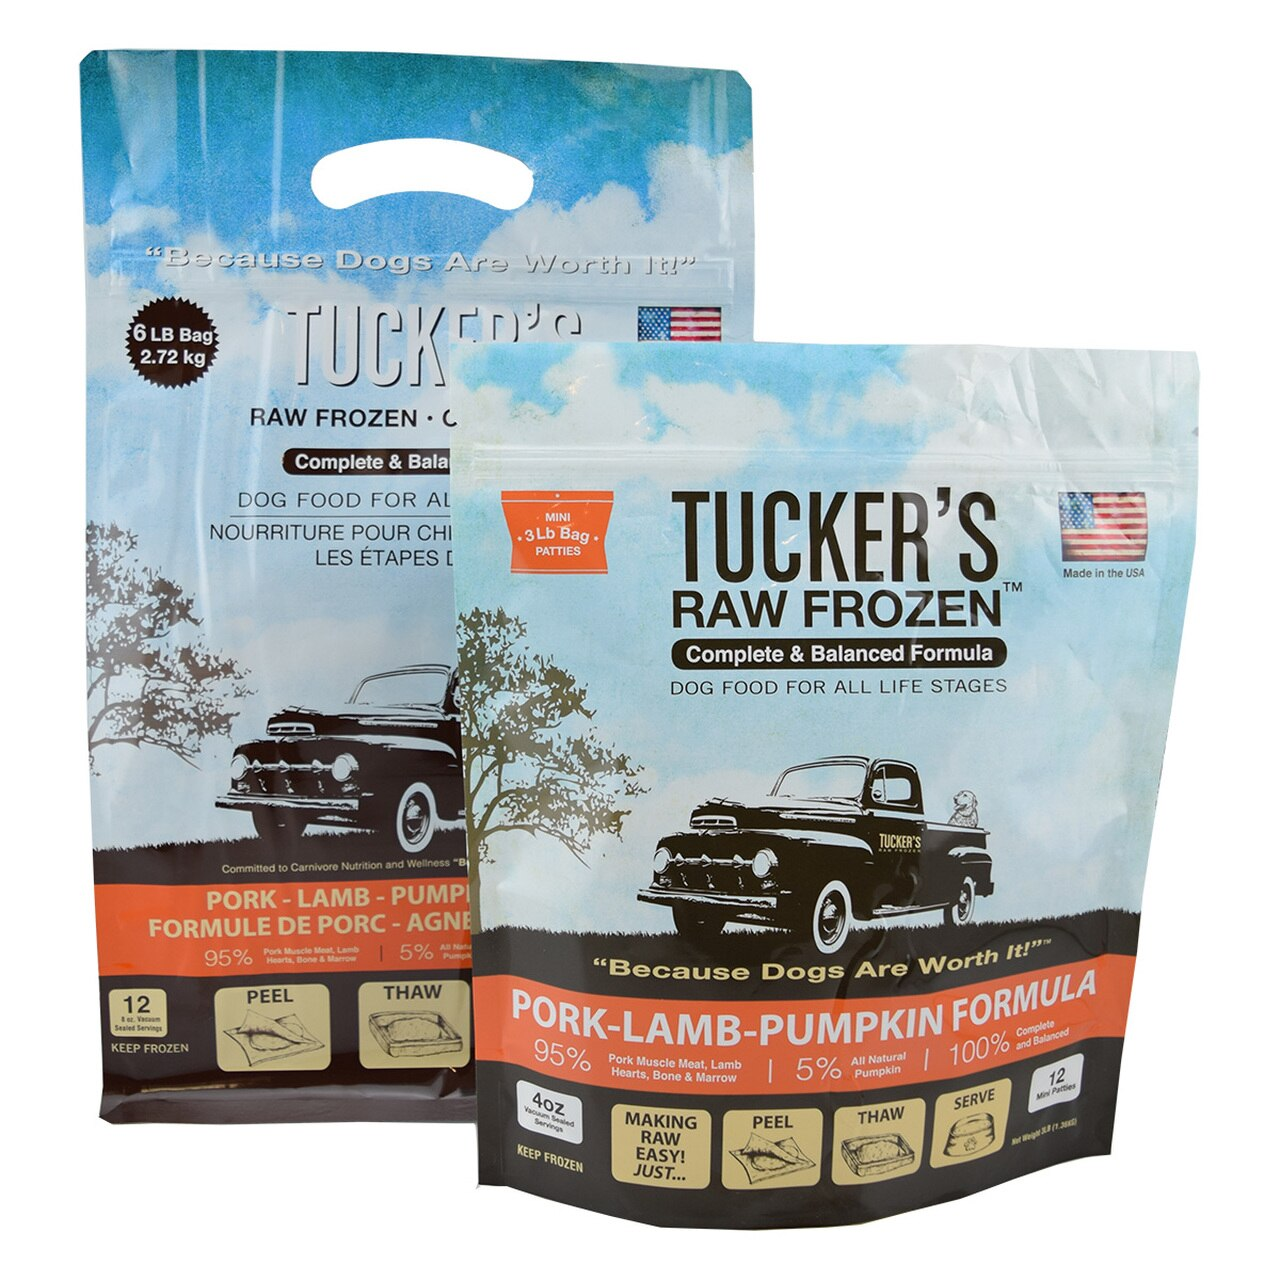 Tucker's Raw Frozen Grain-Free Pork, Lamb & Pumpkin Formula Raw Frozen Dog Food, 3-lb